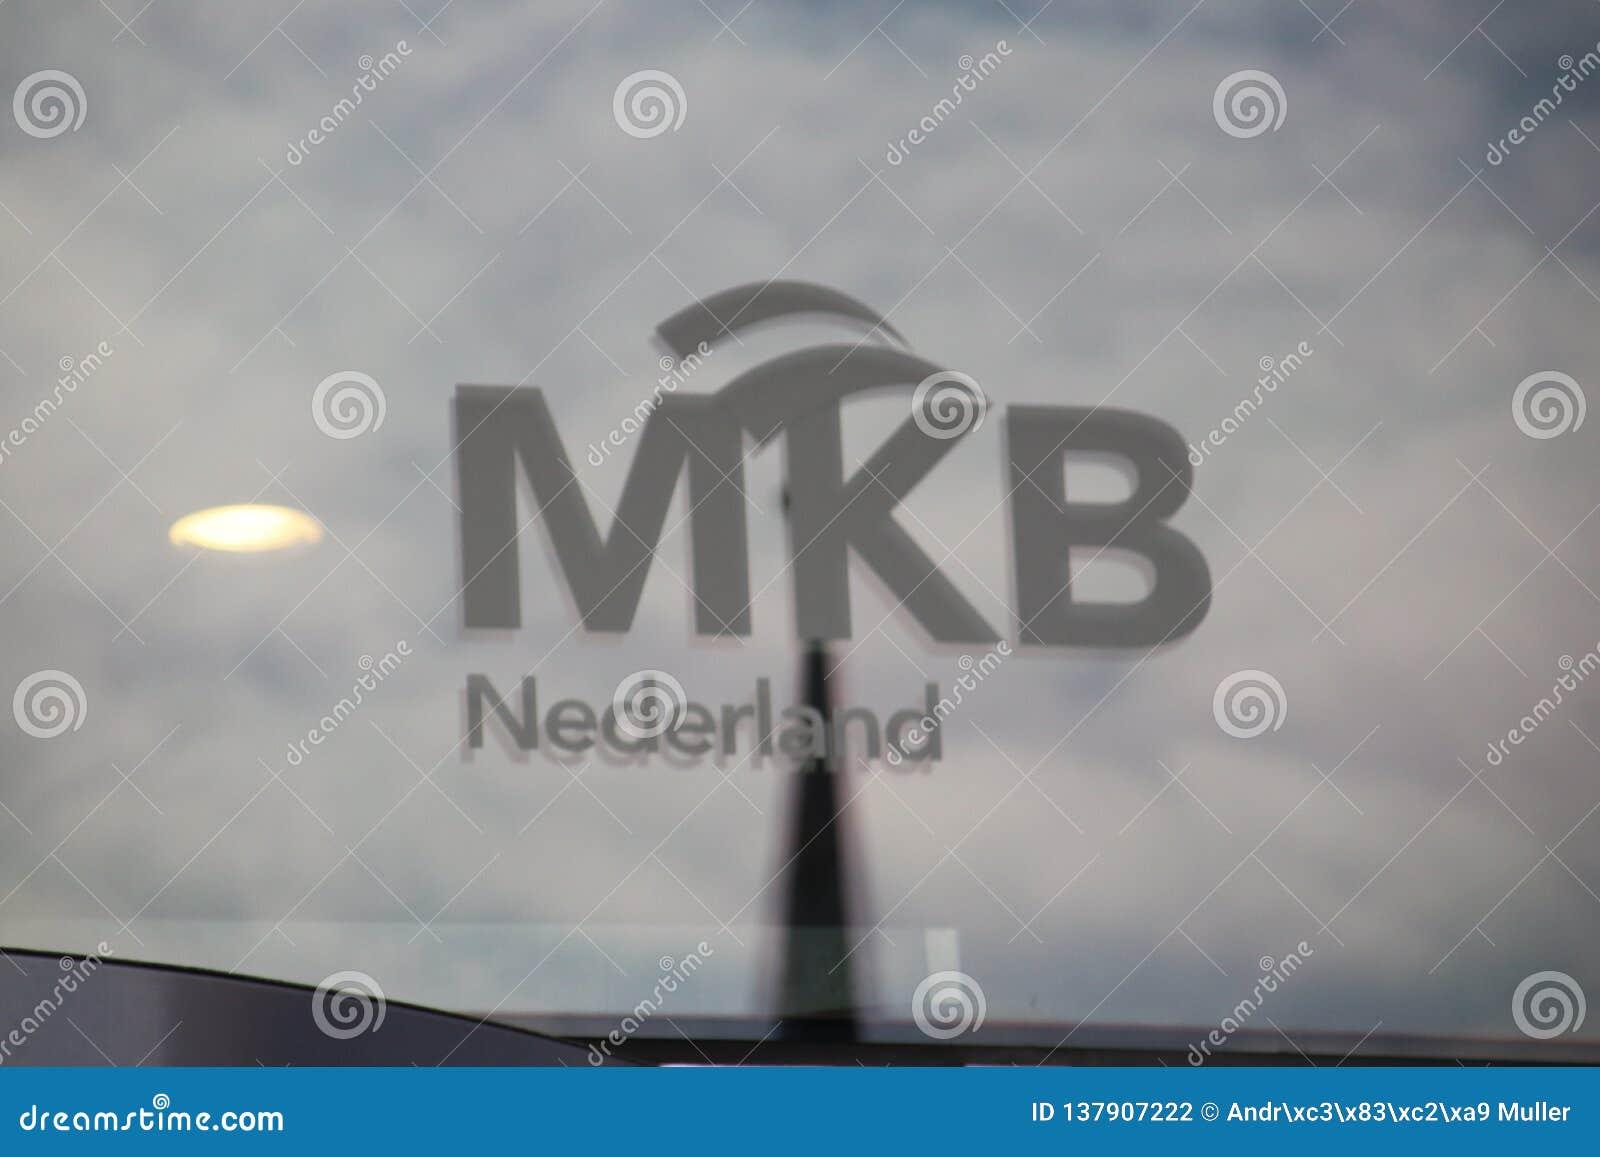 Логотип VNO NCW и MKB Nederland на окнах офиса malietower в вертепе Haag Нидерланд